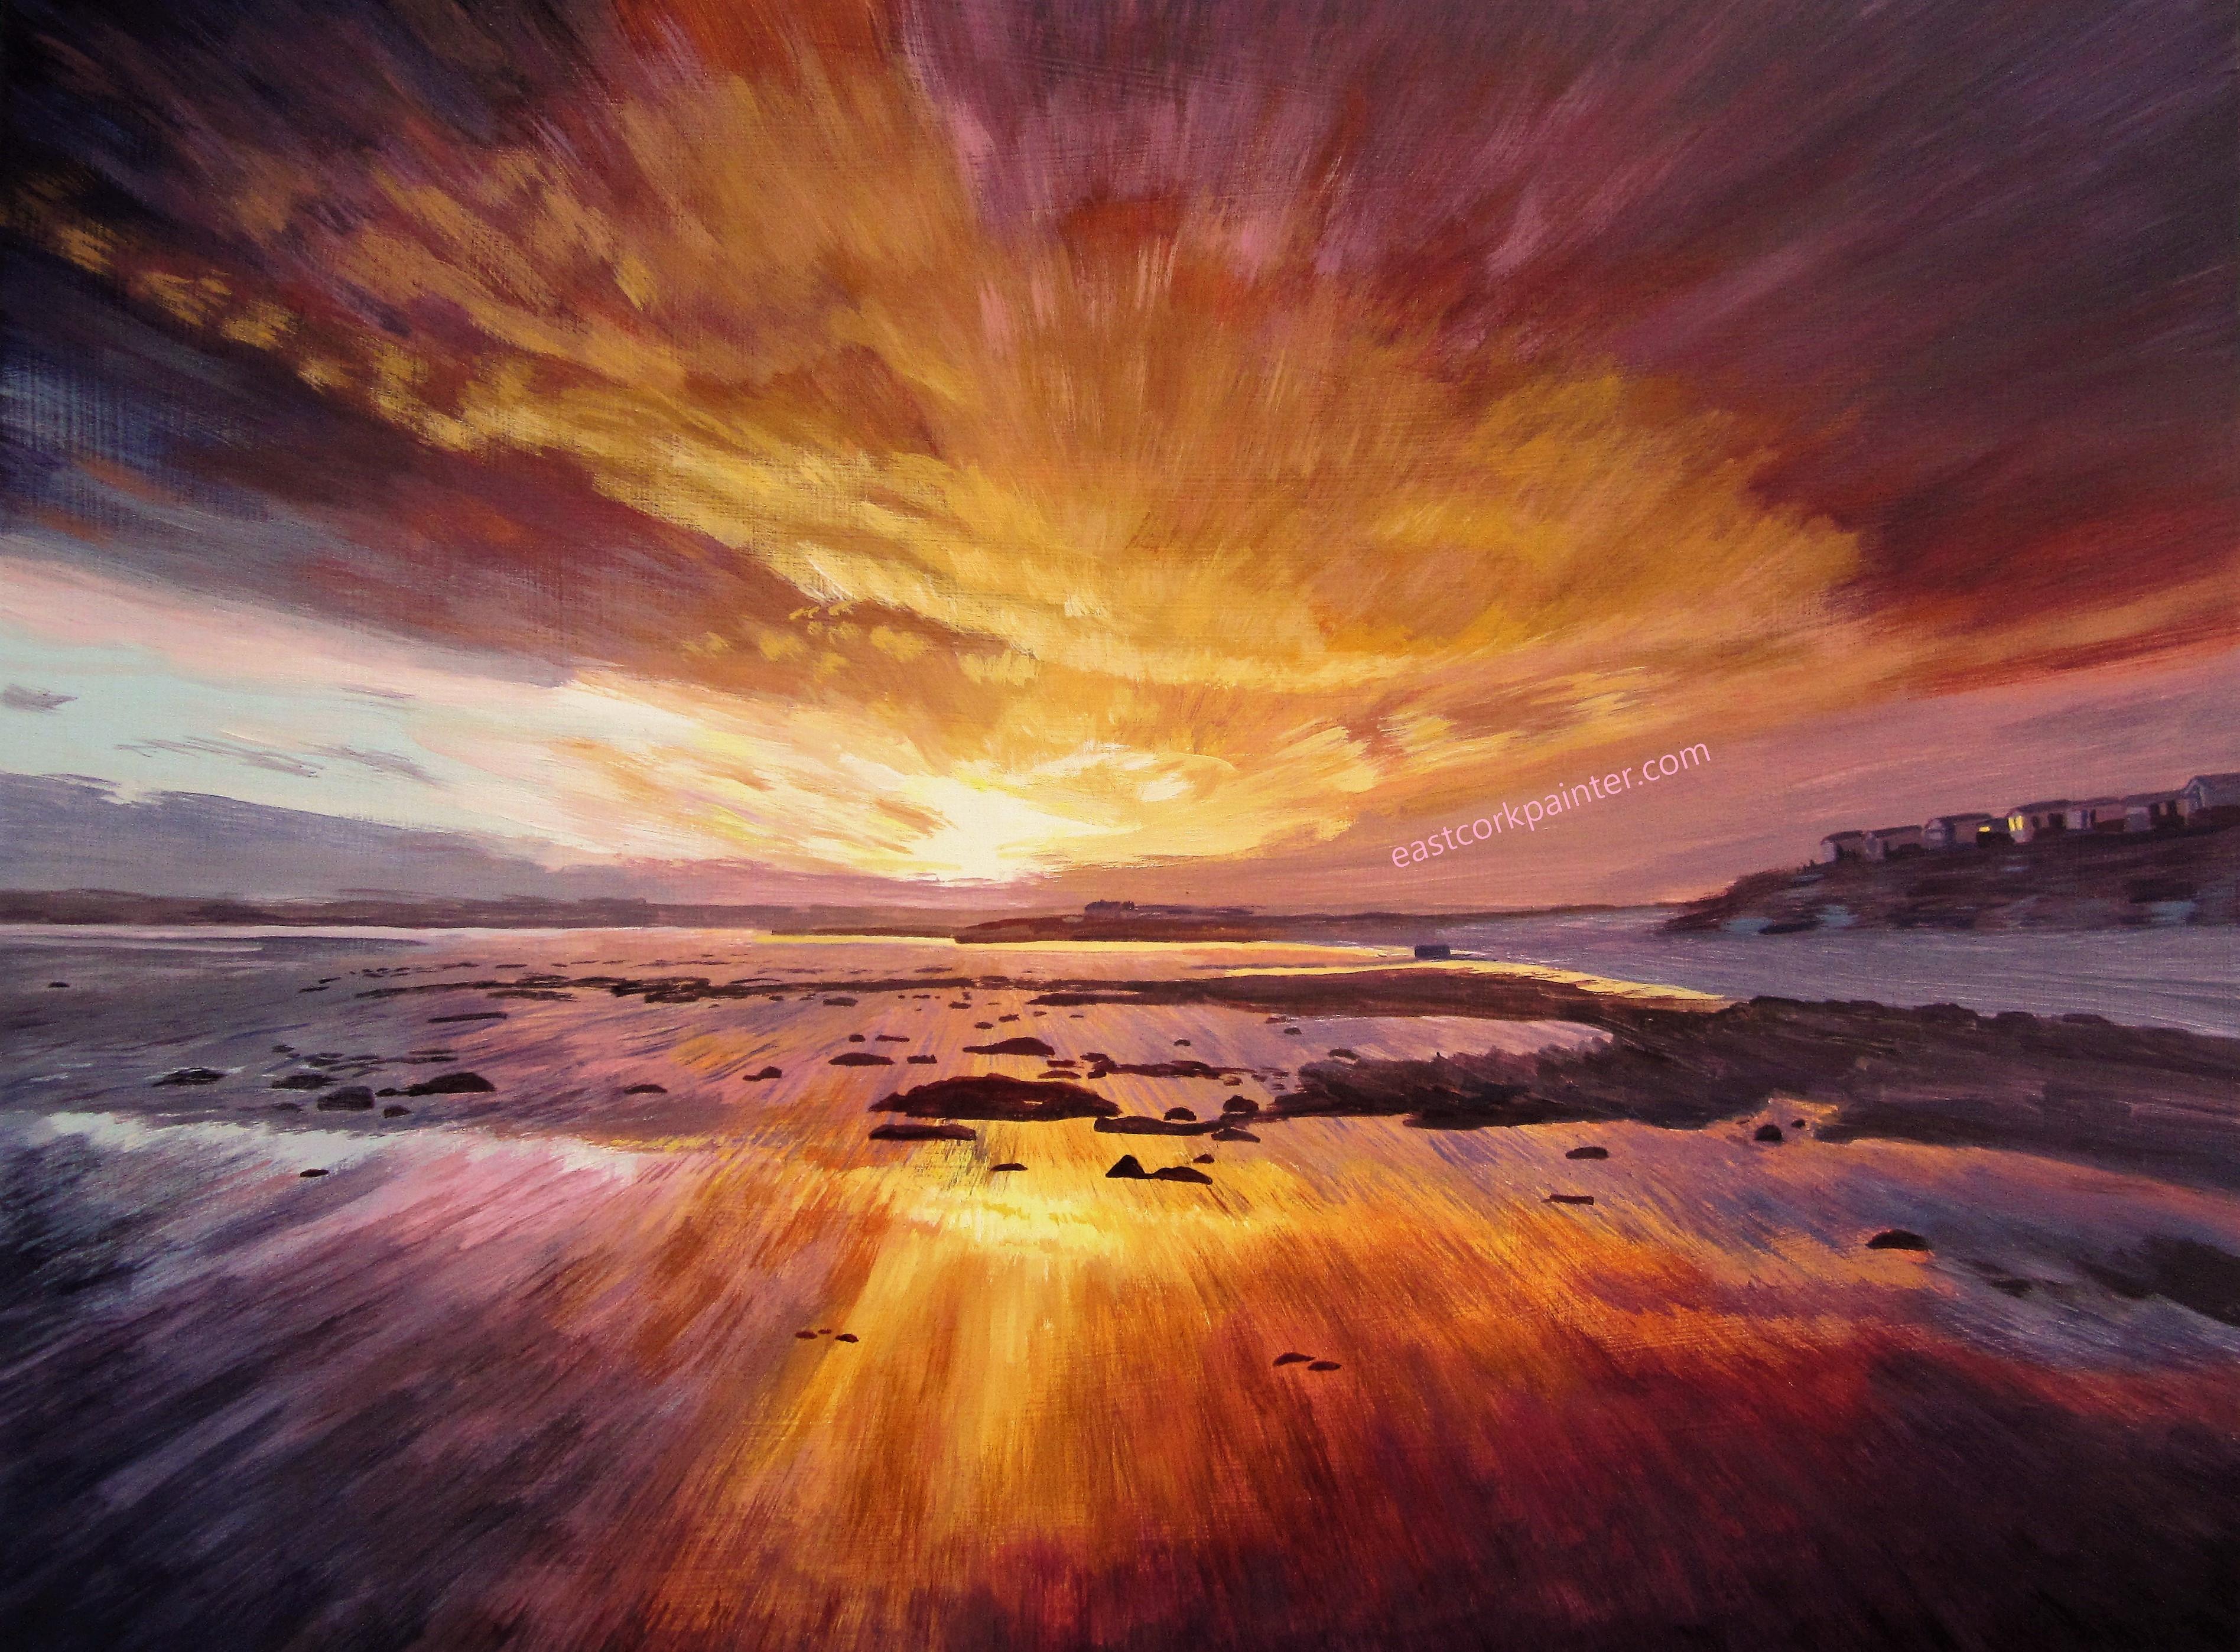 Christmas Eve 2013 Sunset on Garryvoe Beach watermark